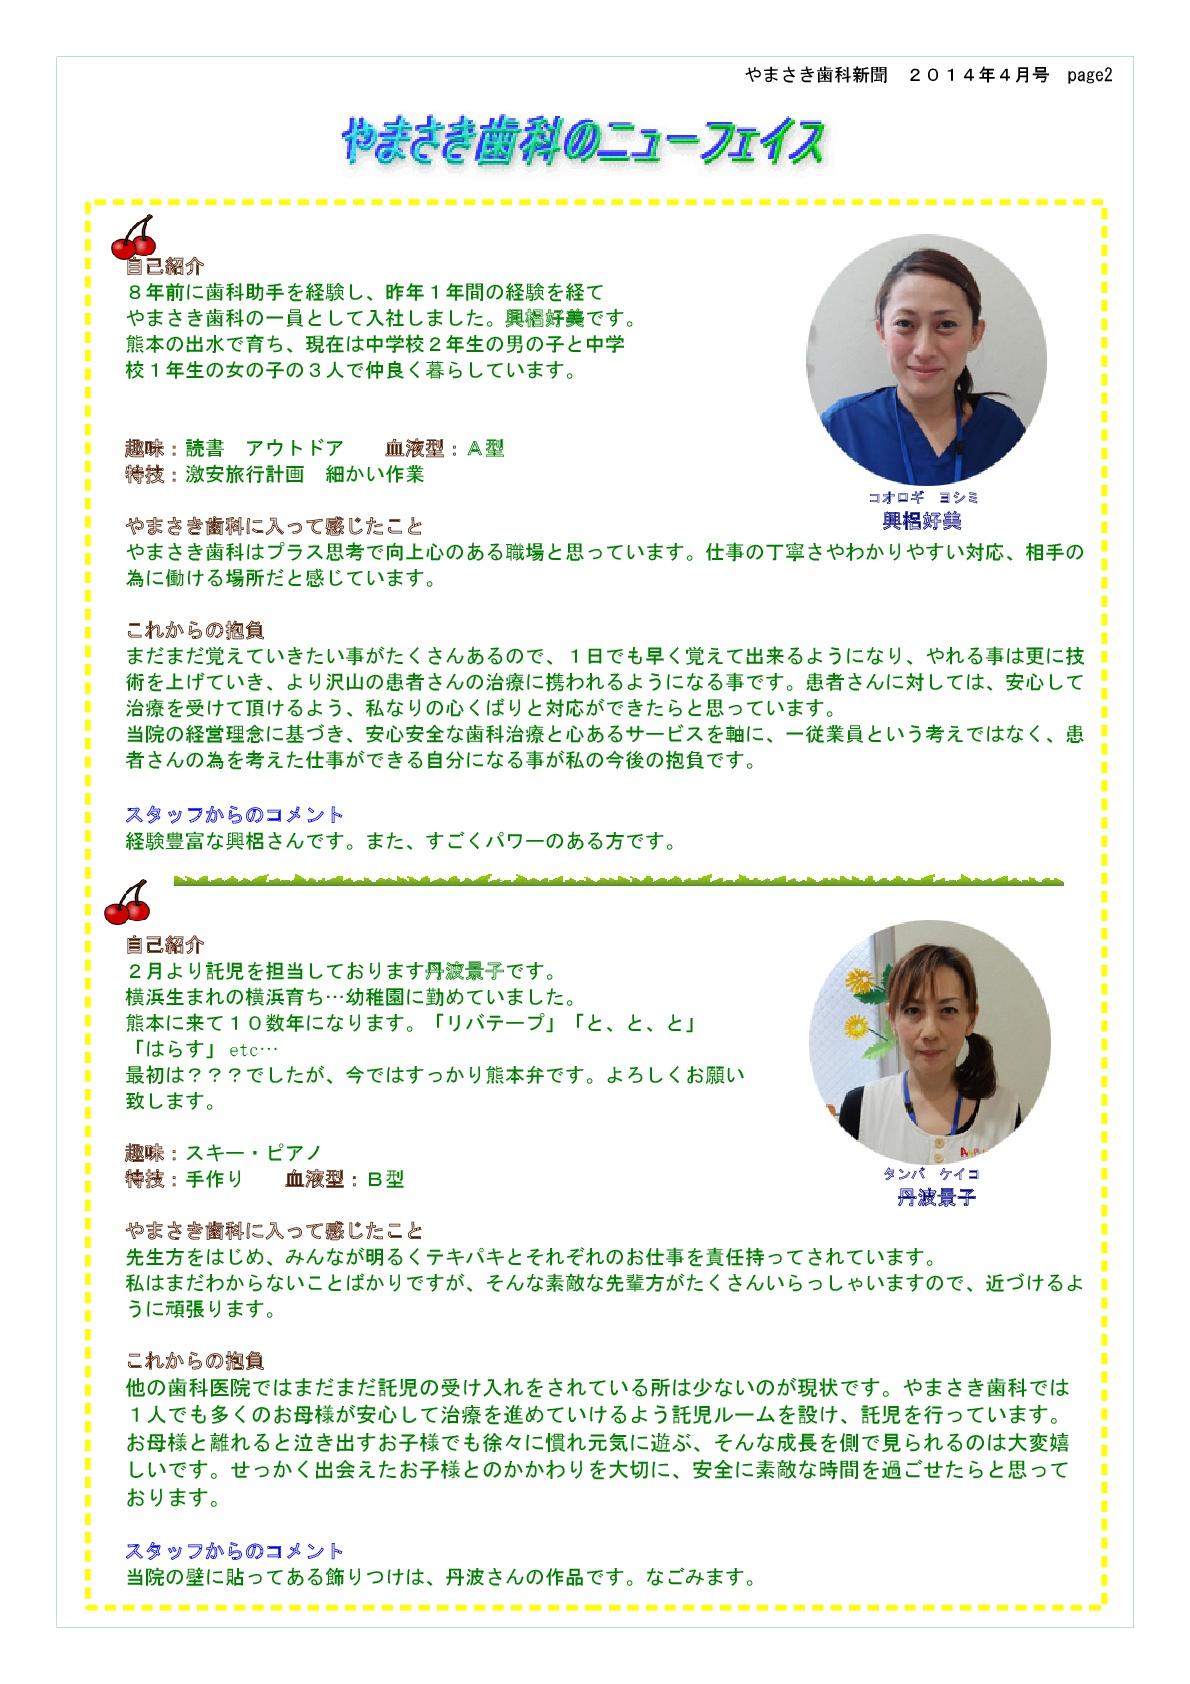 sinbun14-4-2-001